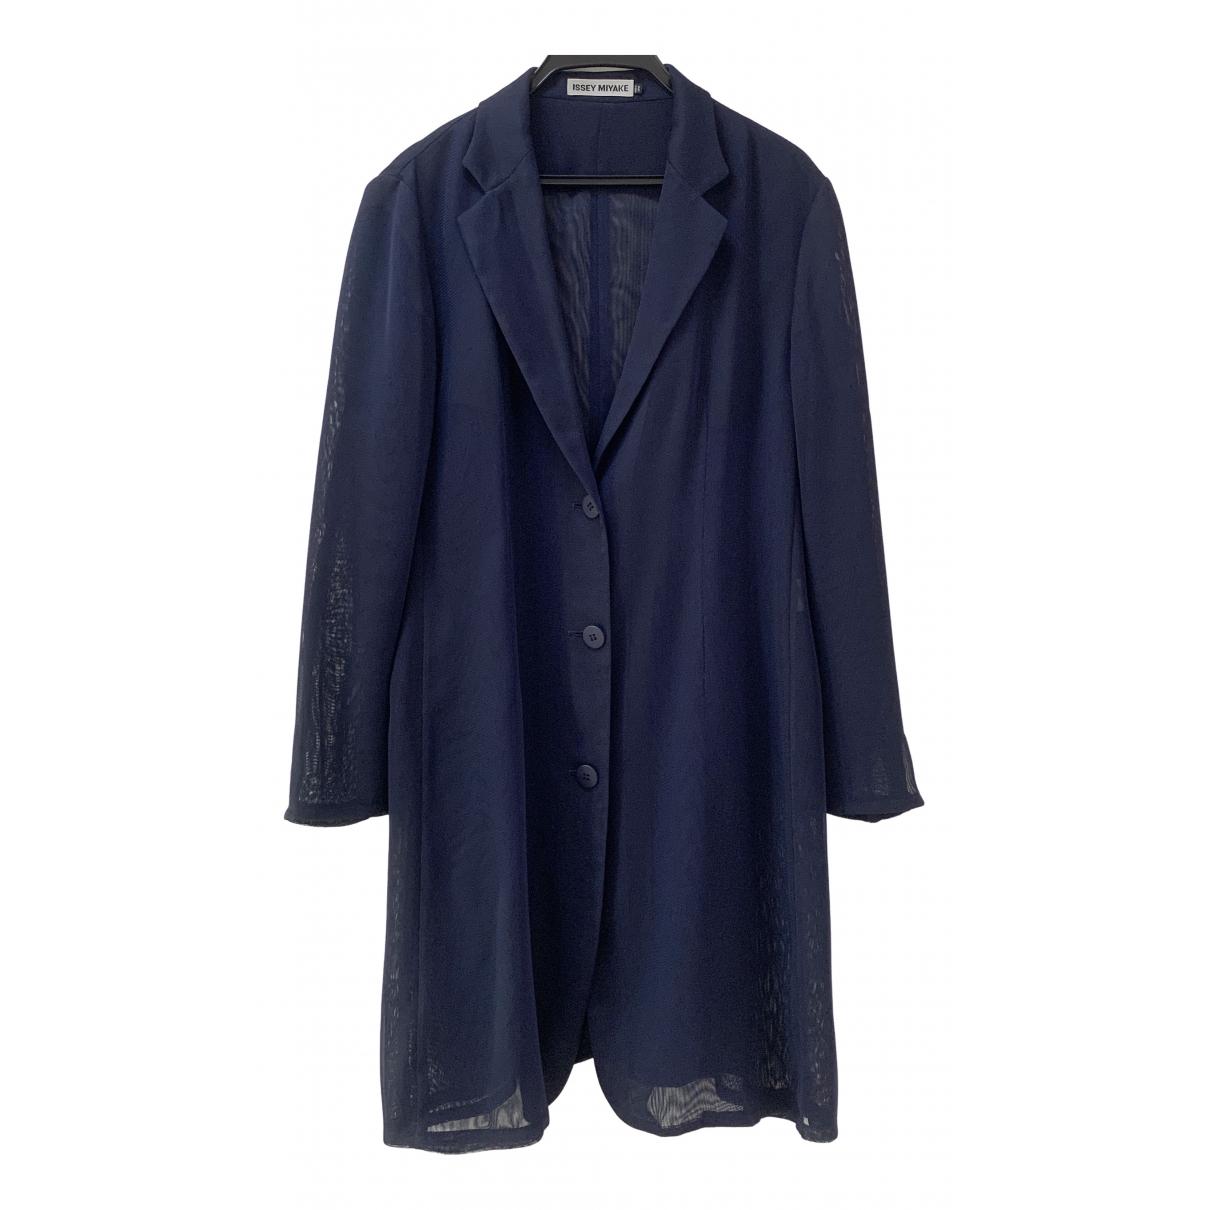 Issey Miyake \N Navy coat for Women One Size International